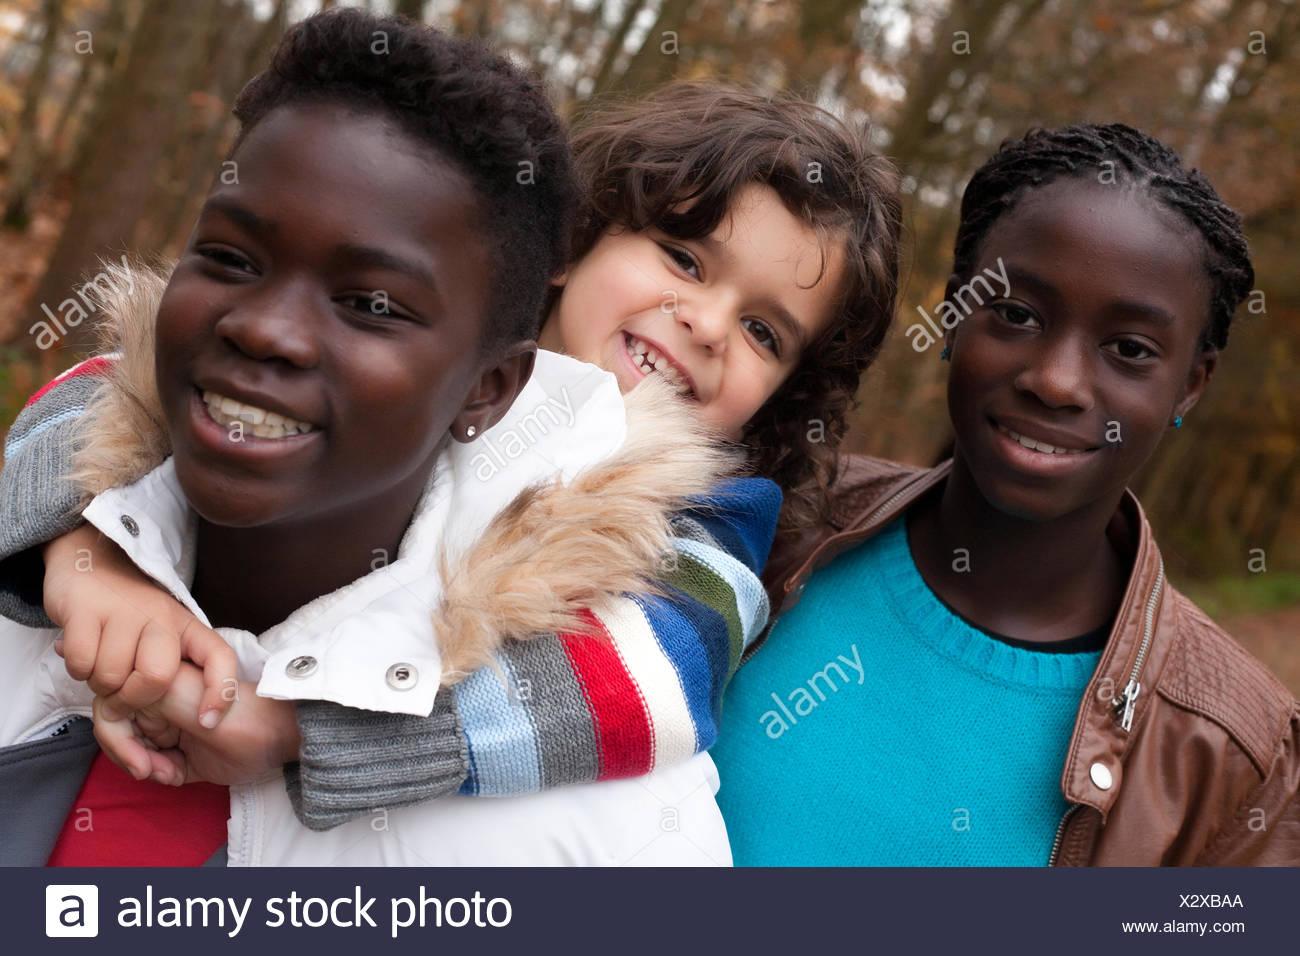 My adoption sisters - Stock Image